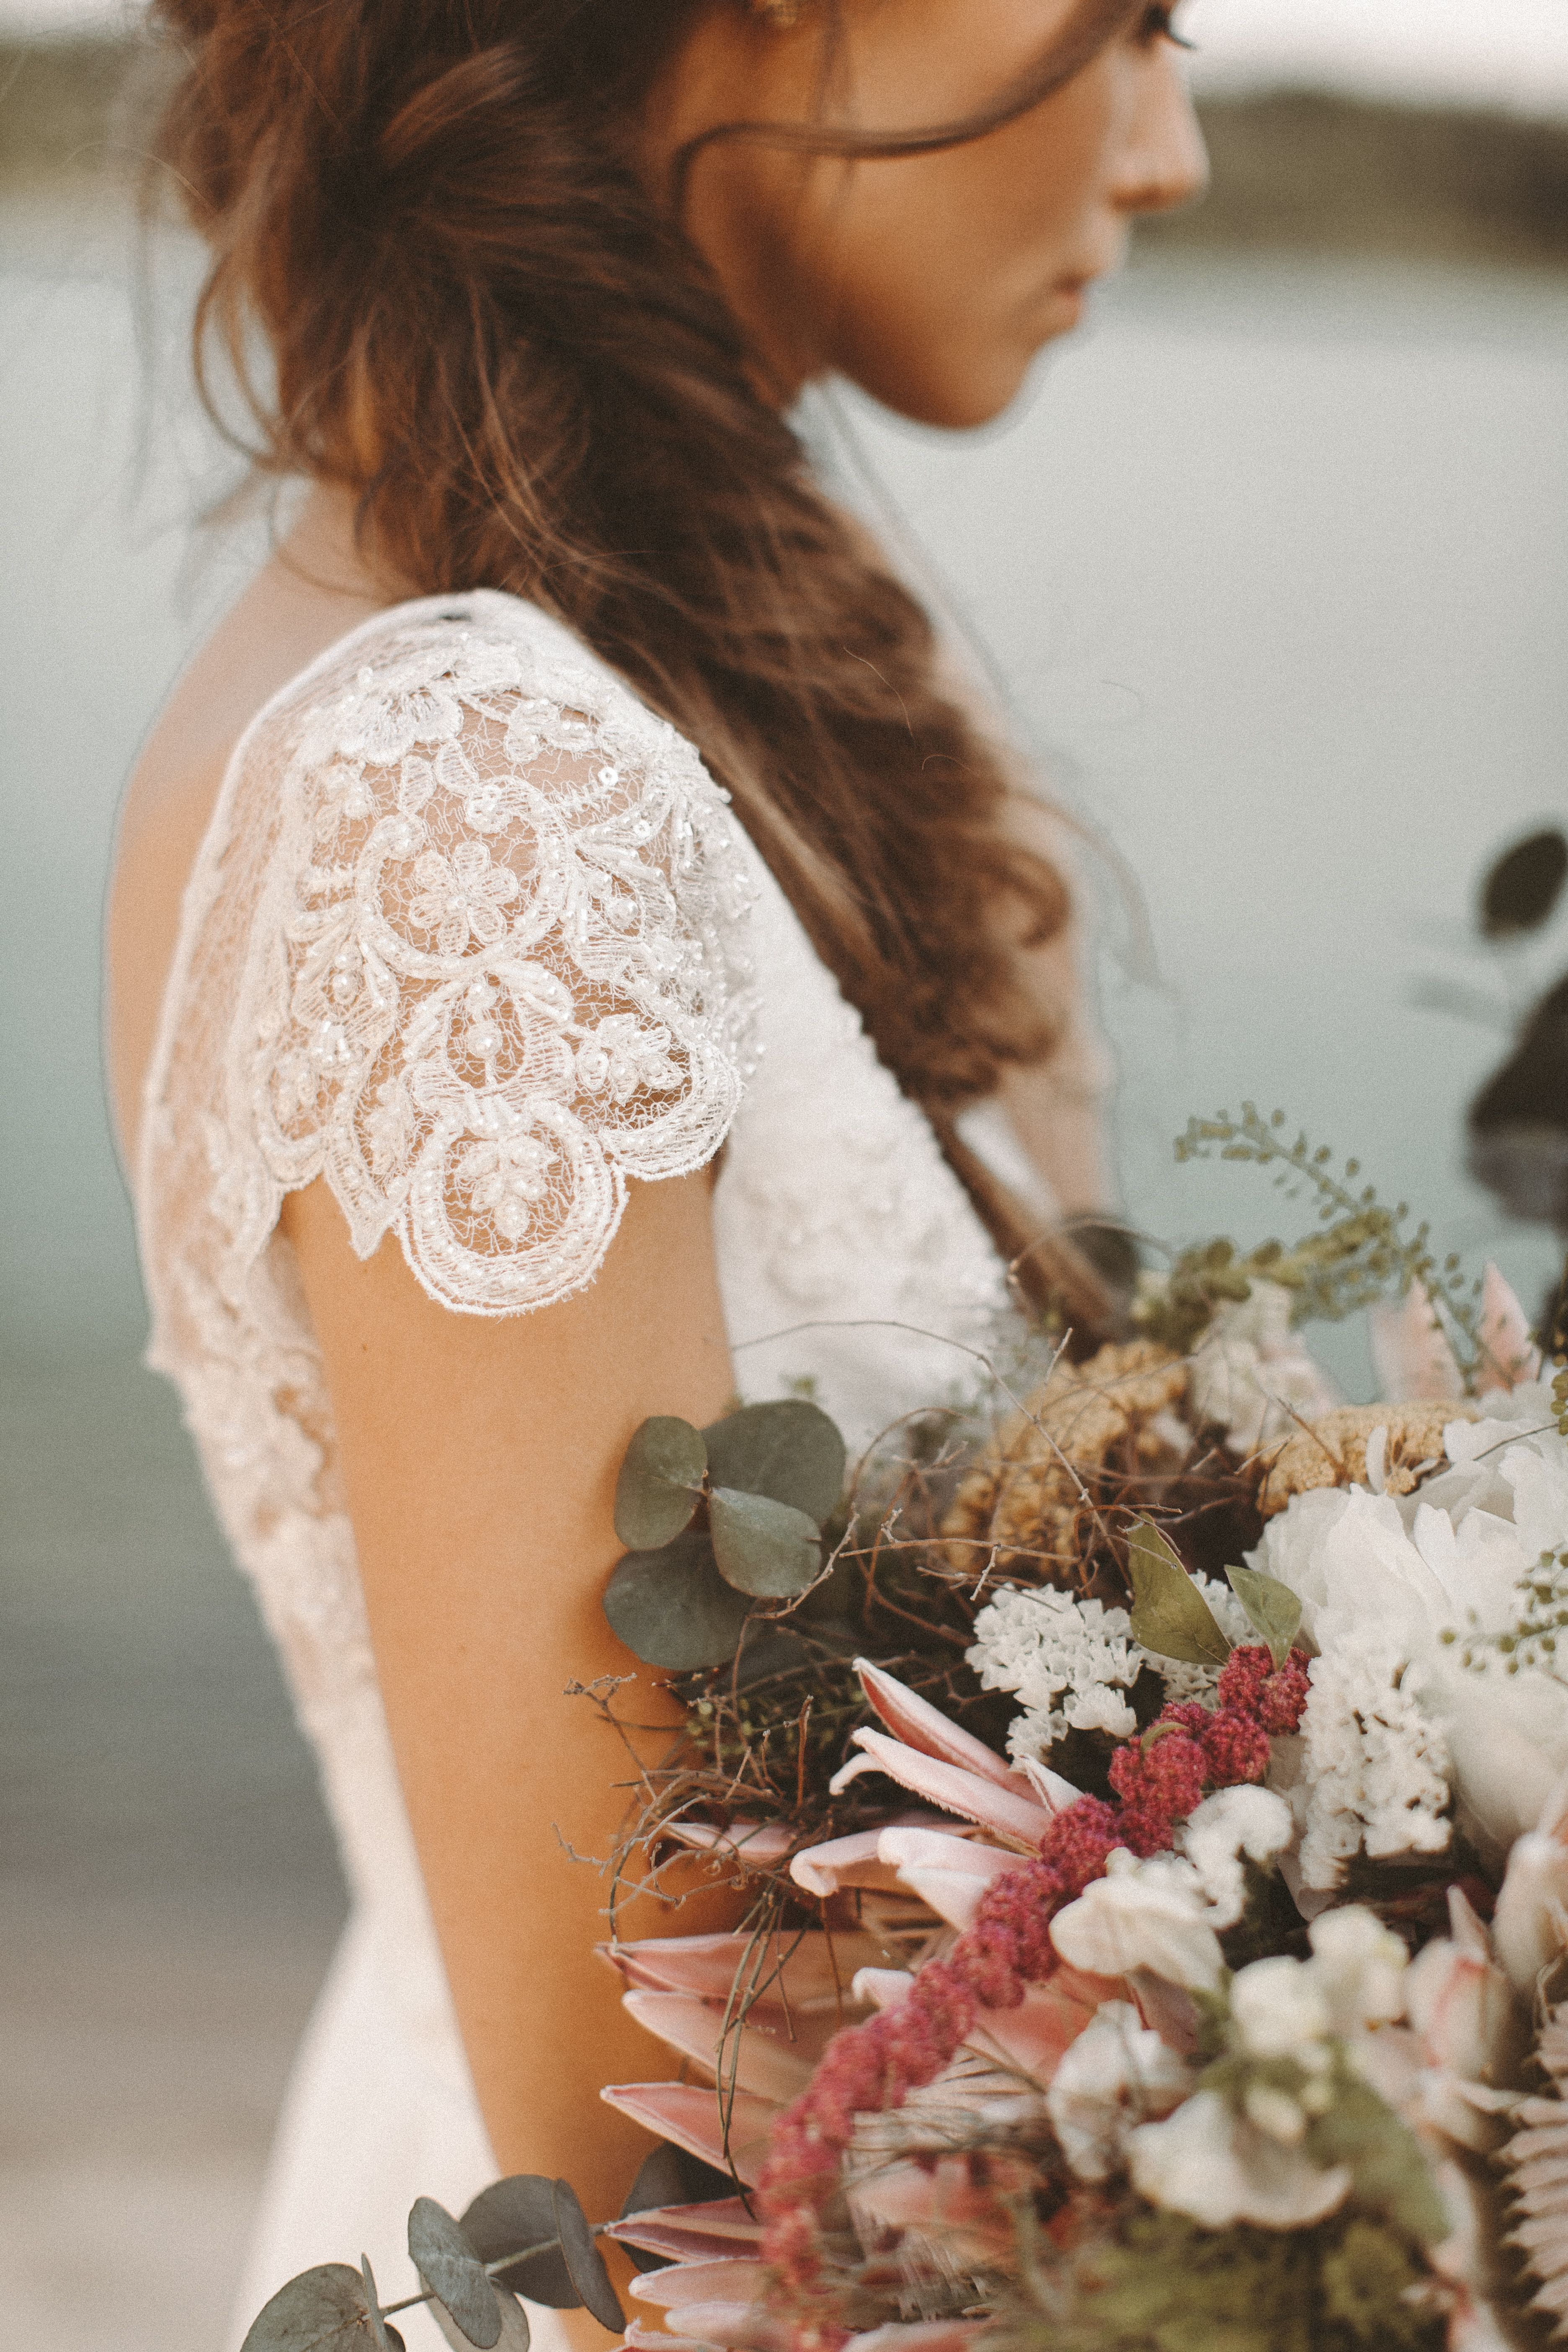 Vestido de novia que fluye escote trasero de encaje vestido de novia boho vintage